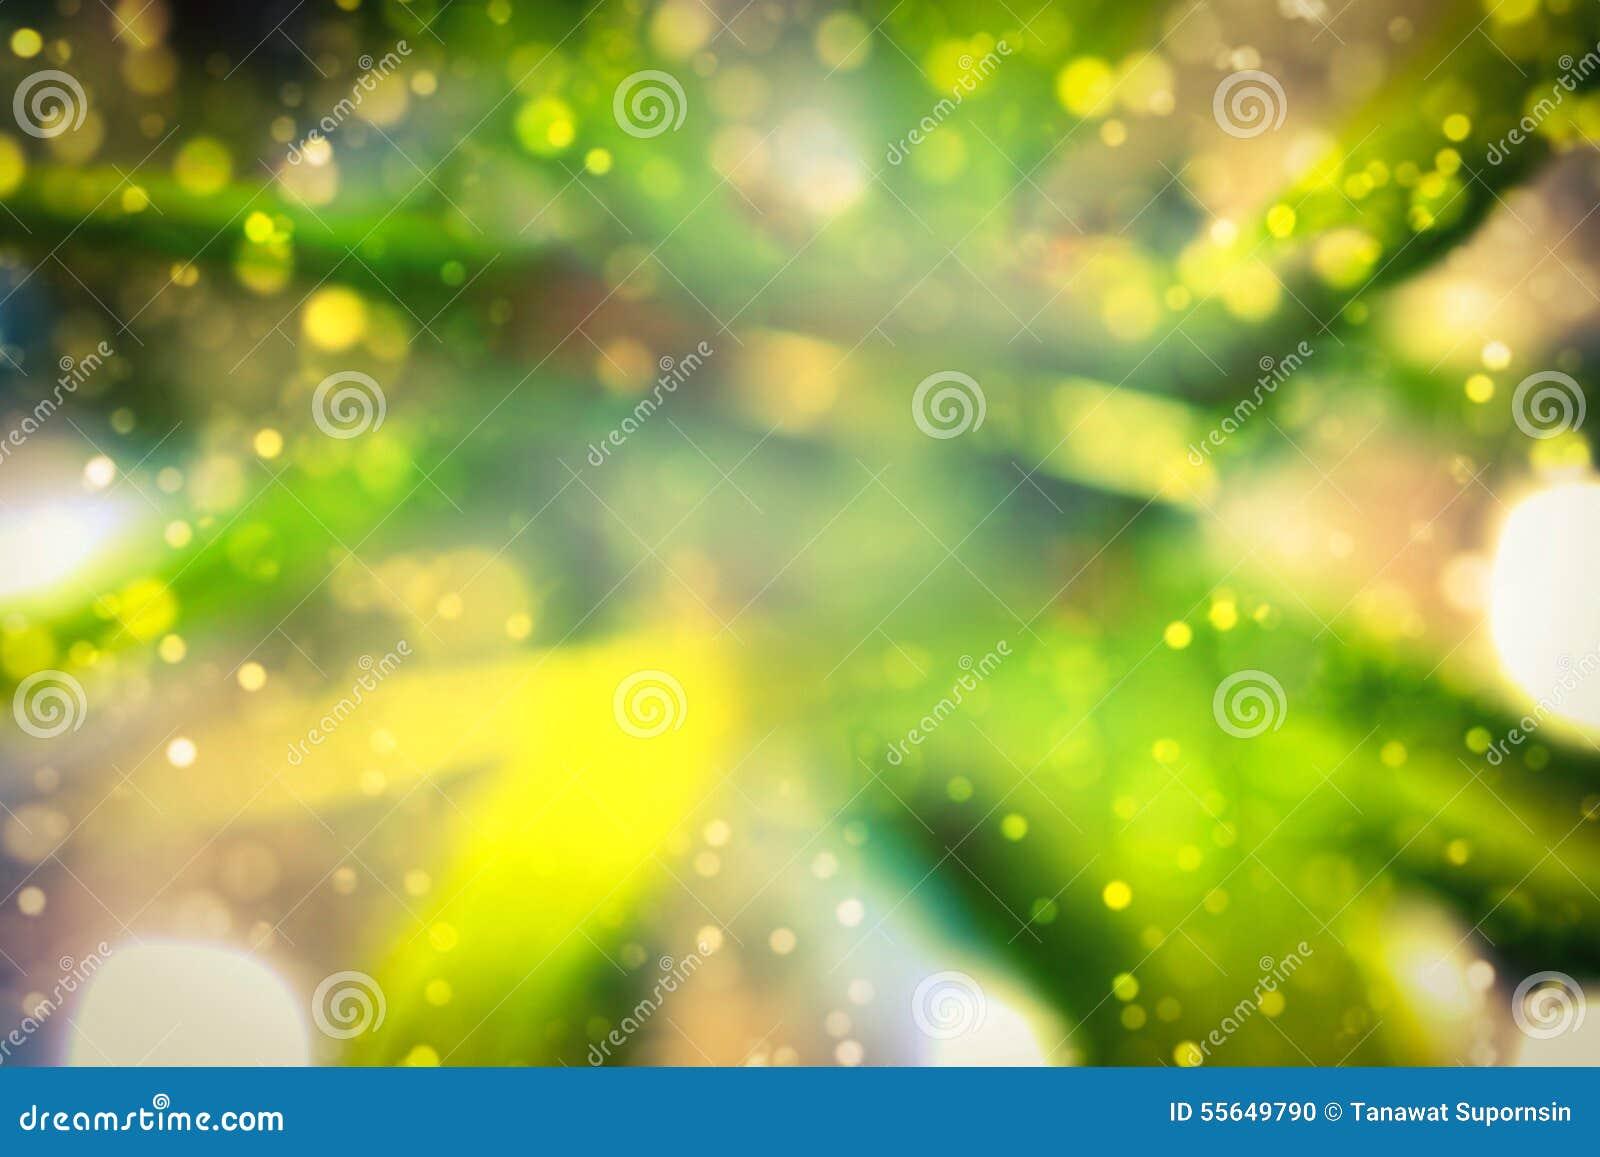 Abstract Blur Bokeh Green Yellow Gold Color Wallpaper Stock Photo ...